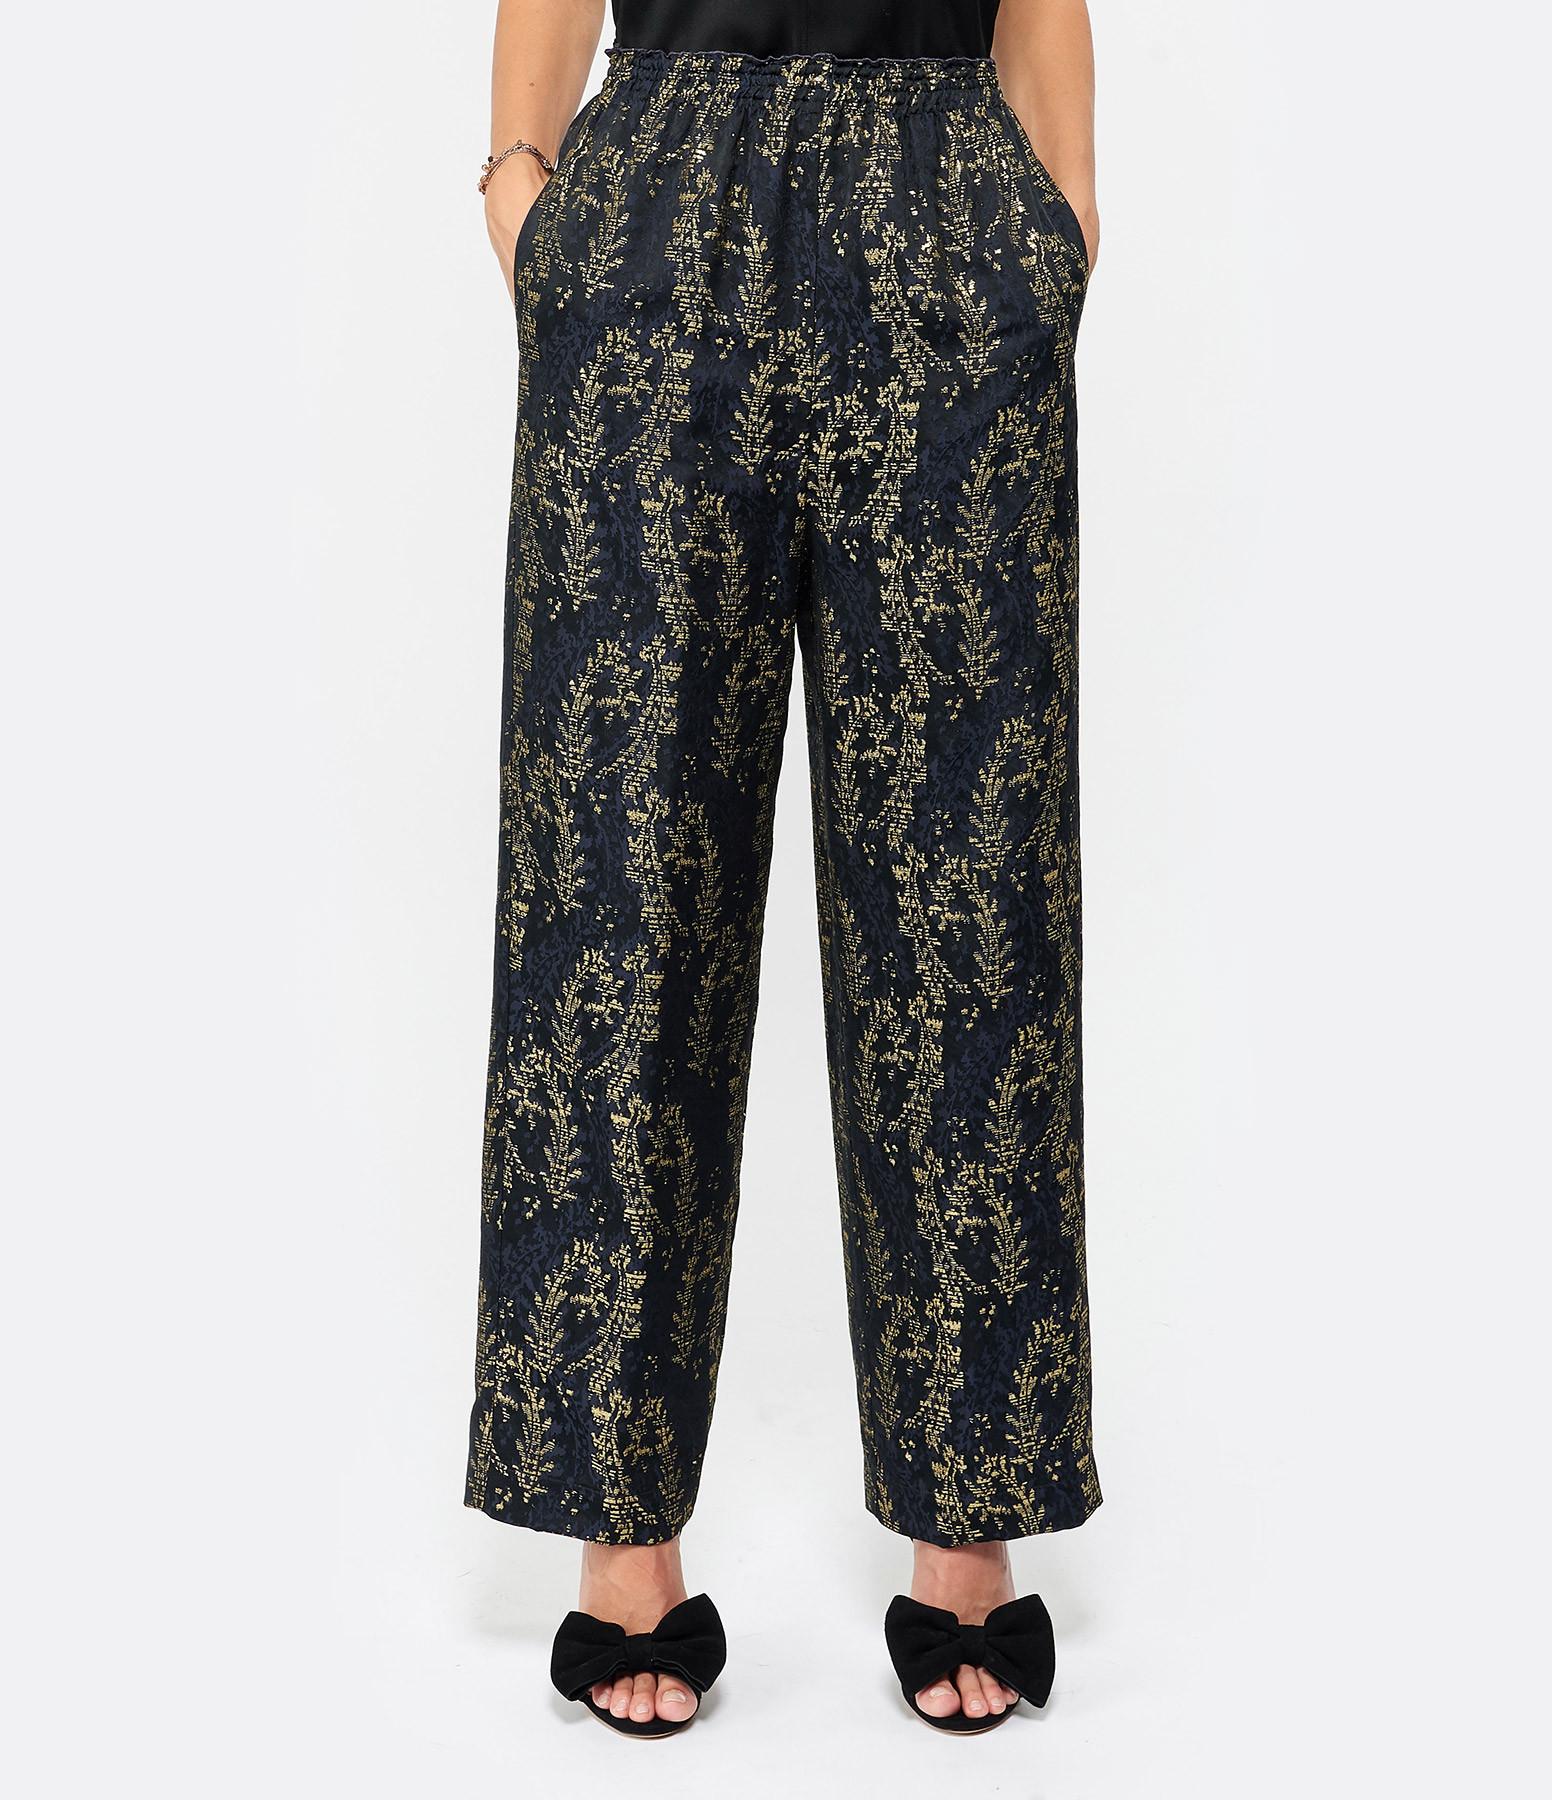 FORTE_FORTE - Pantalon Gipsy Gold Jaquard Bleu Nuit